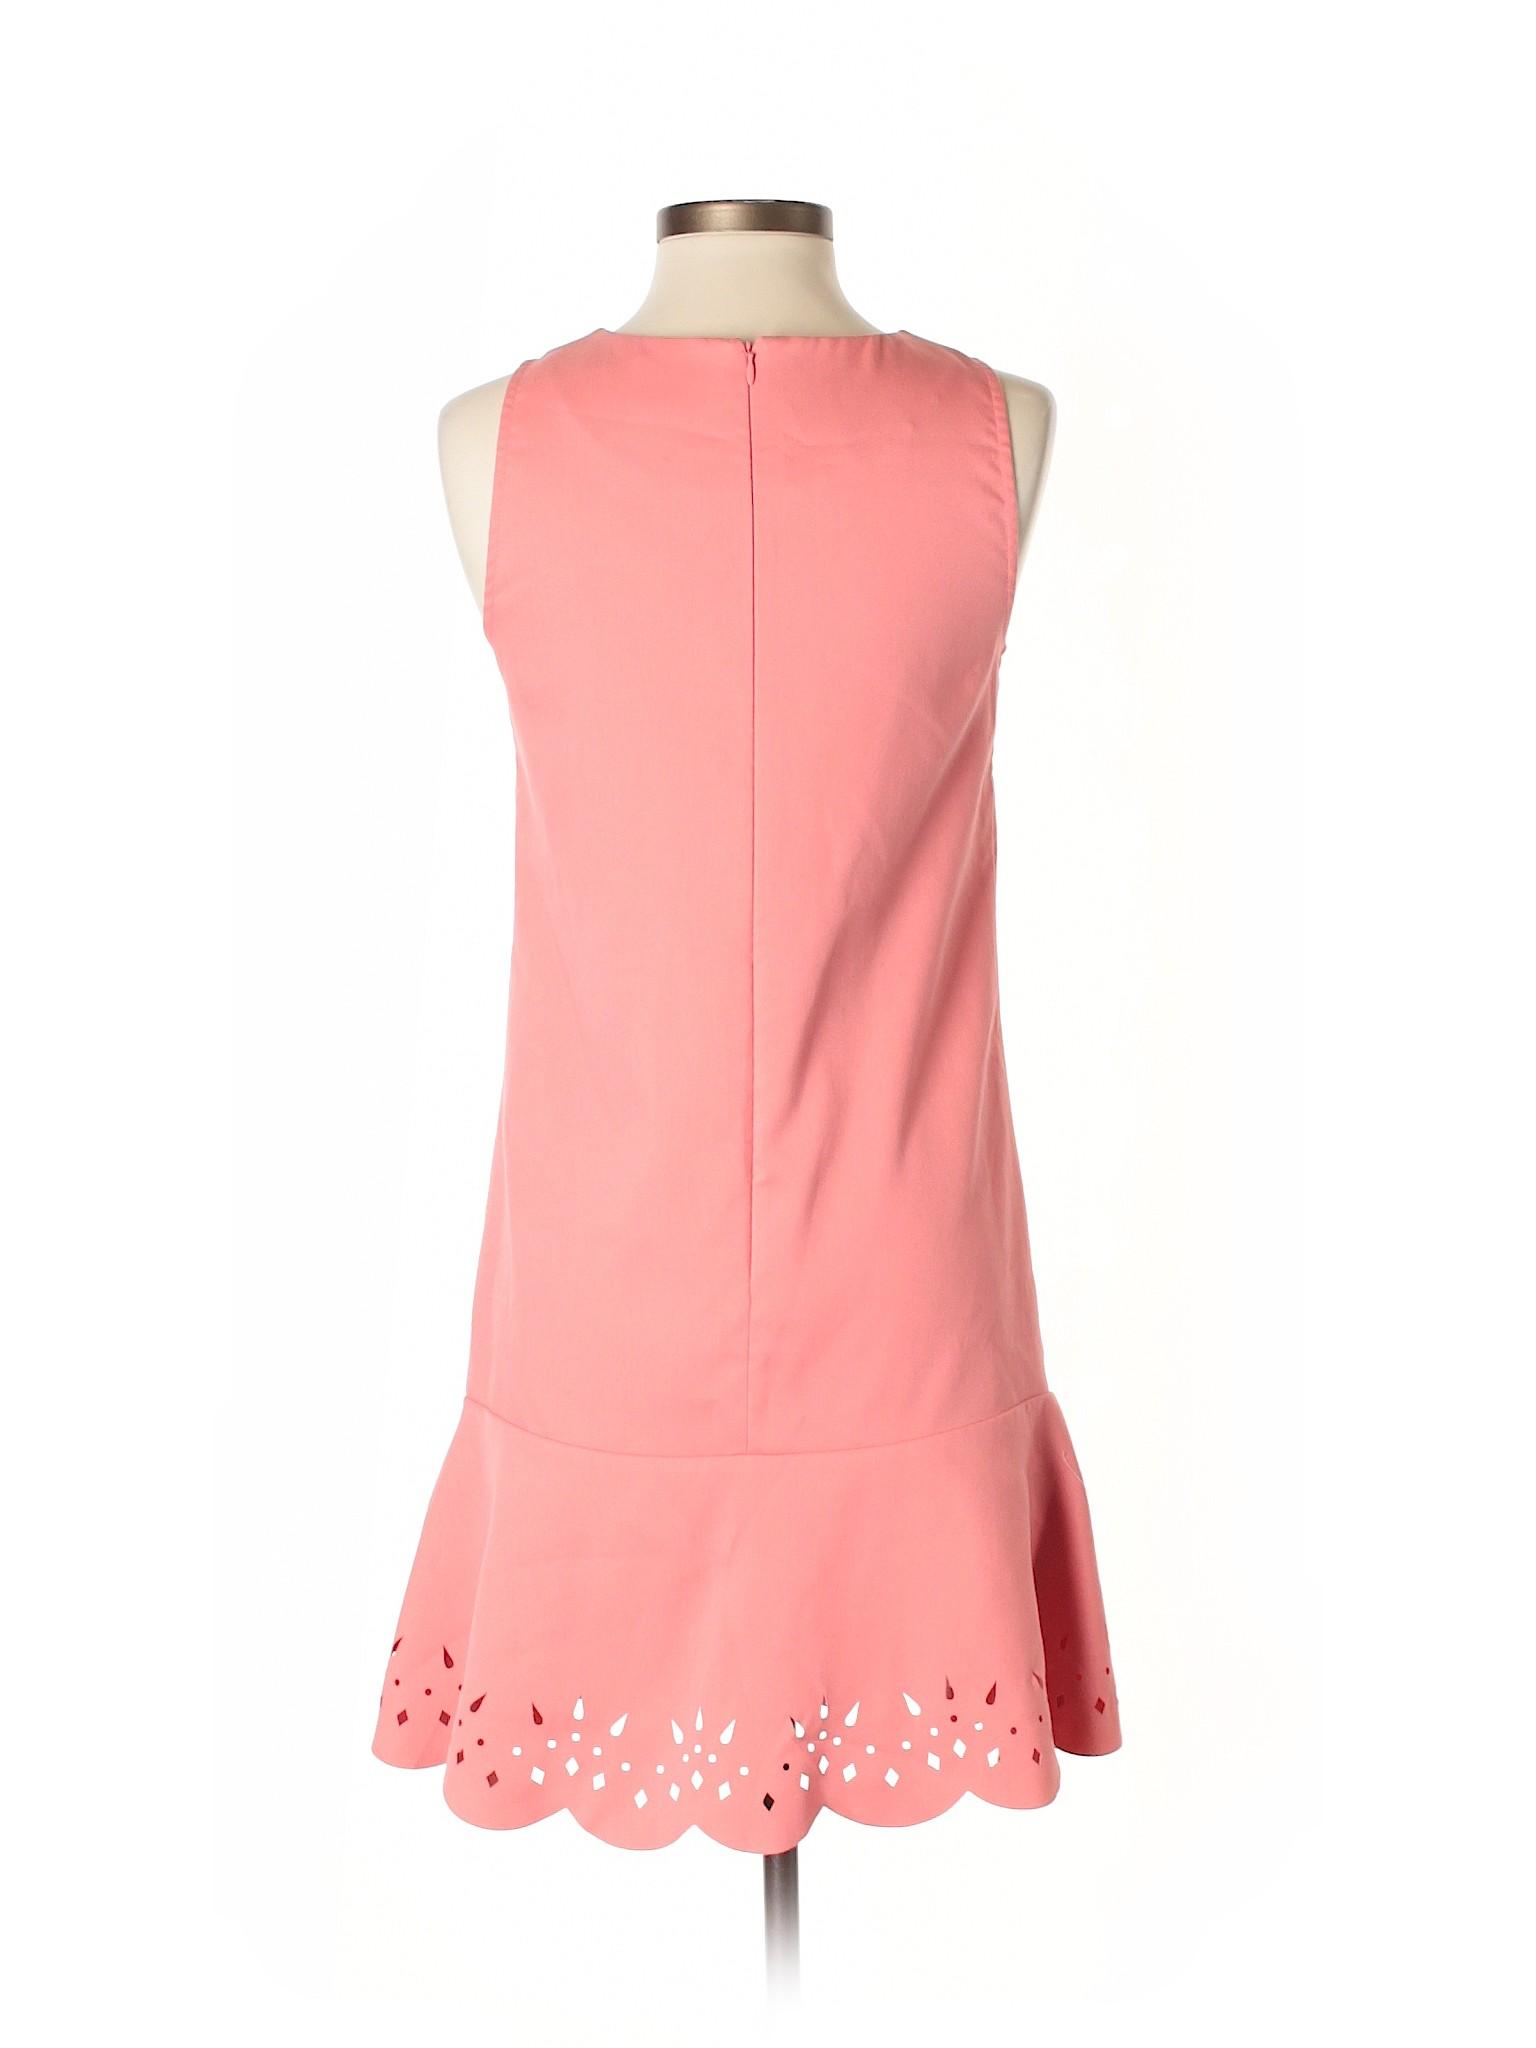 Boutique Taylor Winter Casual Loft Dress Ann Fq8crF